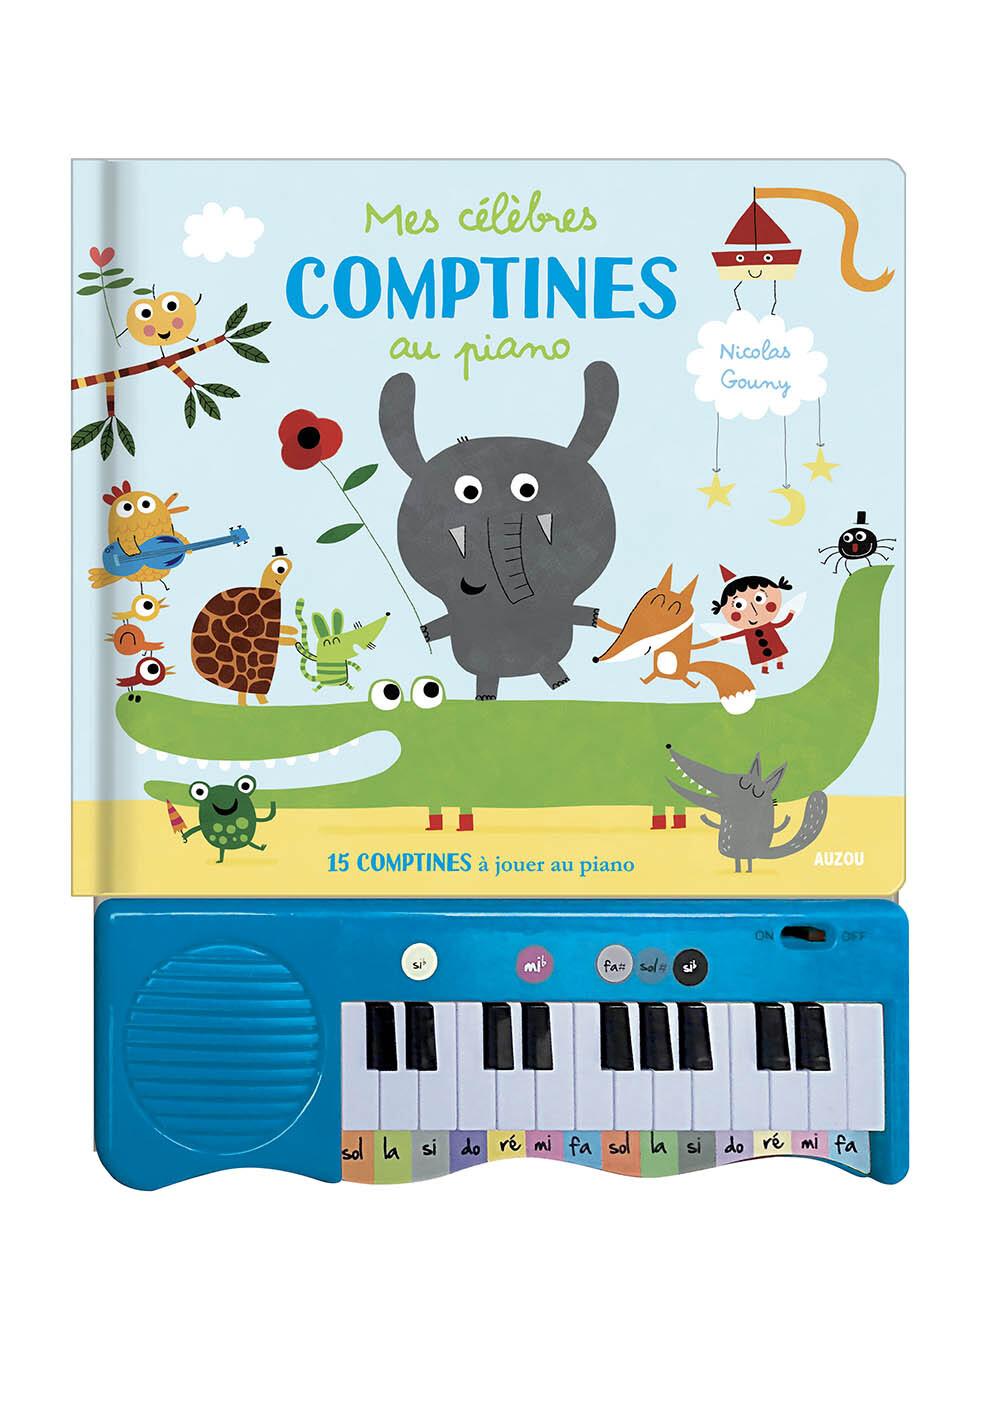 MES CELEBRES COMPTINES AU PIANO - 15 COMPTINES A JOUER AU PIANO